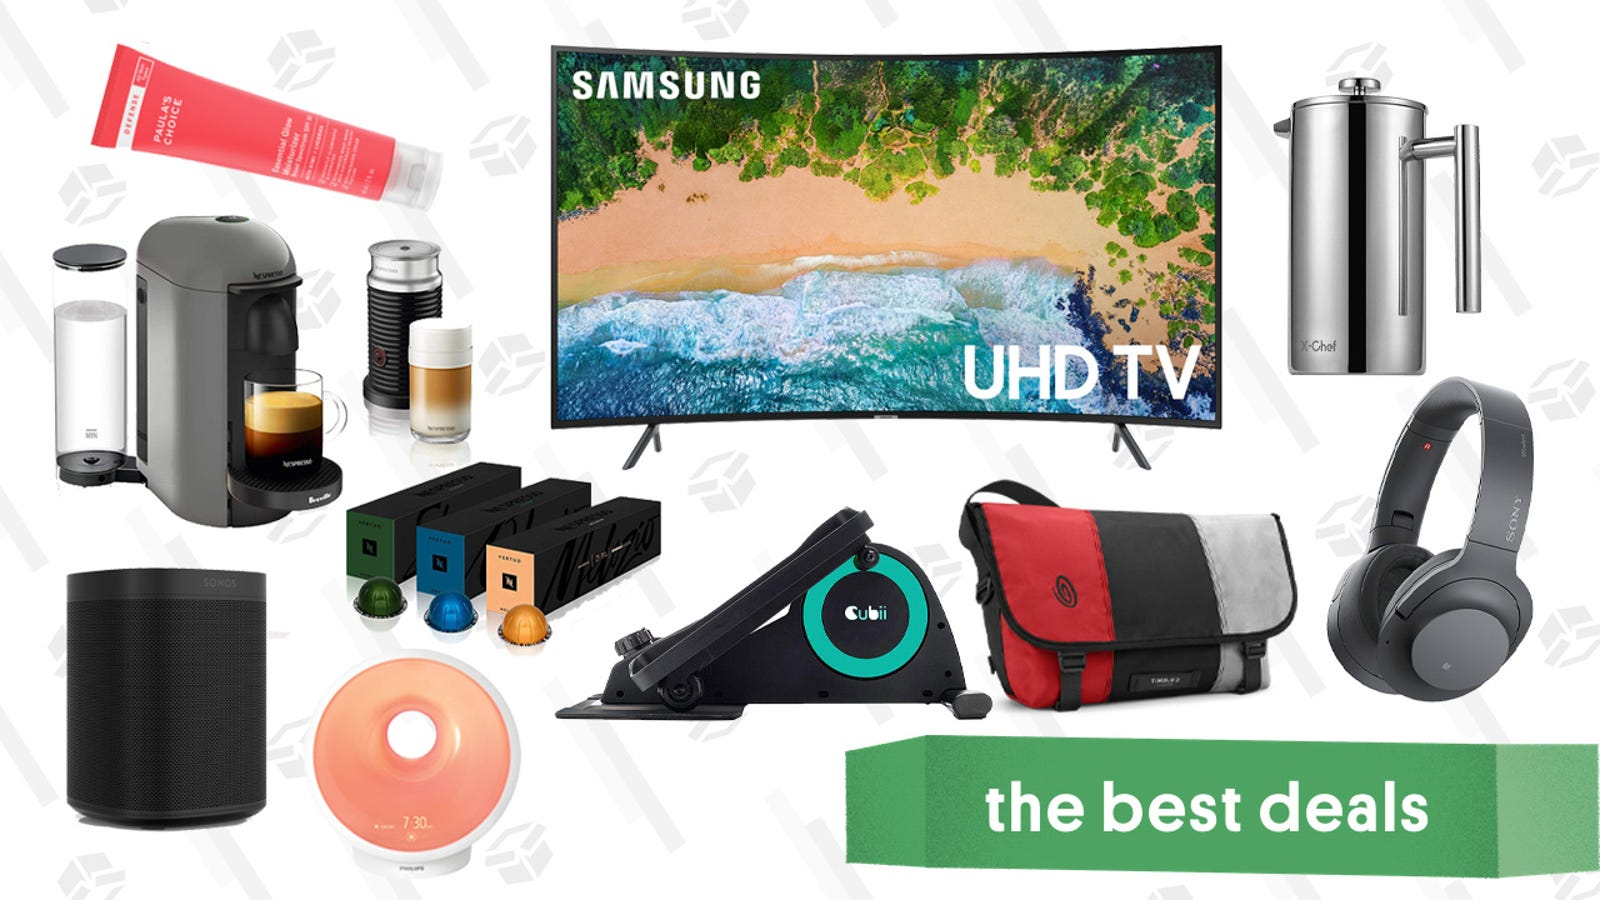 QnA VBage Friday's Best Deals: Sonos One, J.Crew, Sony Headphones, Nespresso, and More